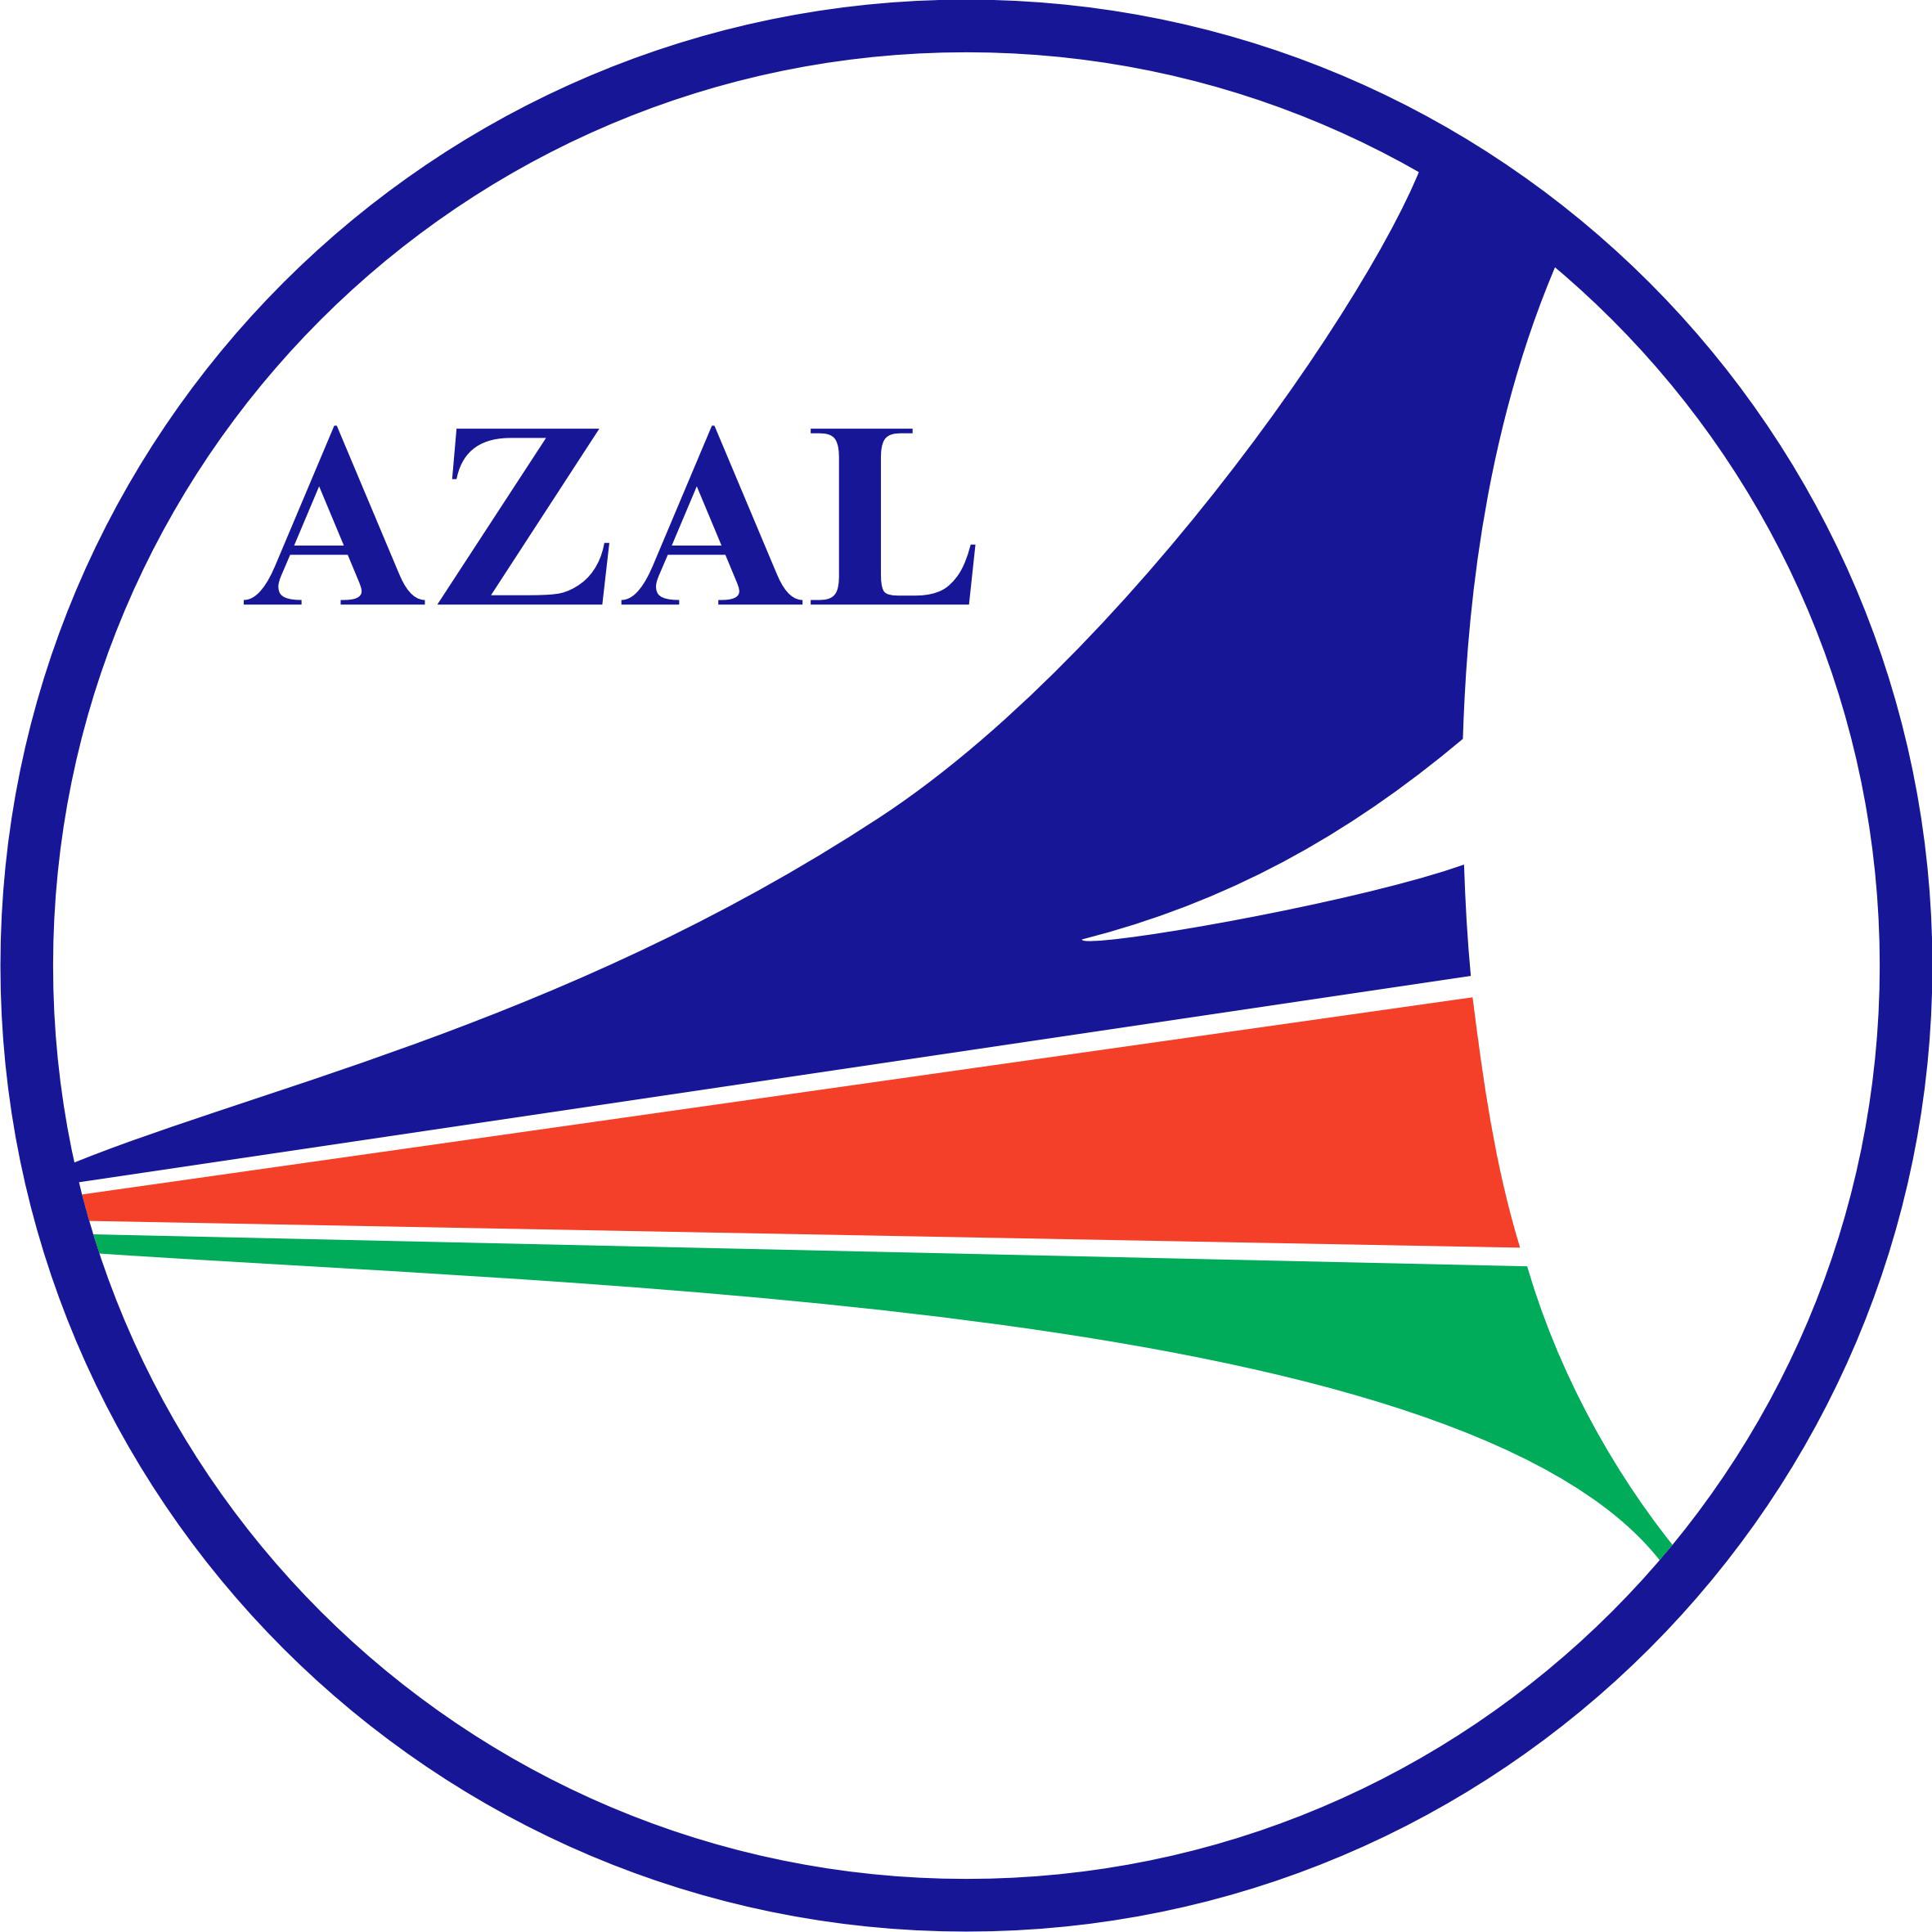 Daxil olunan azerbaycan dili test banki à sözüne esasen mobil